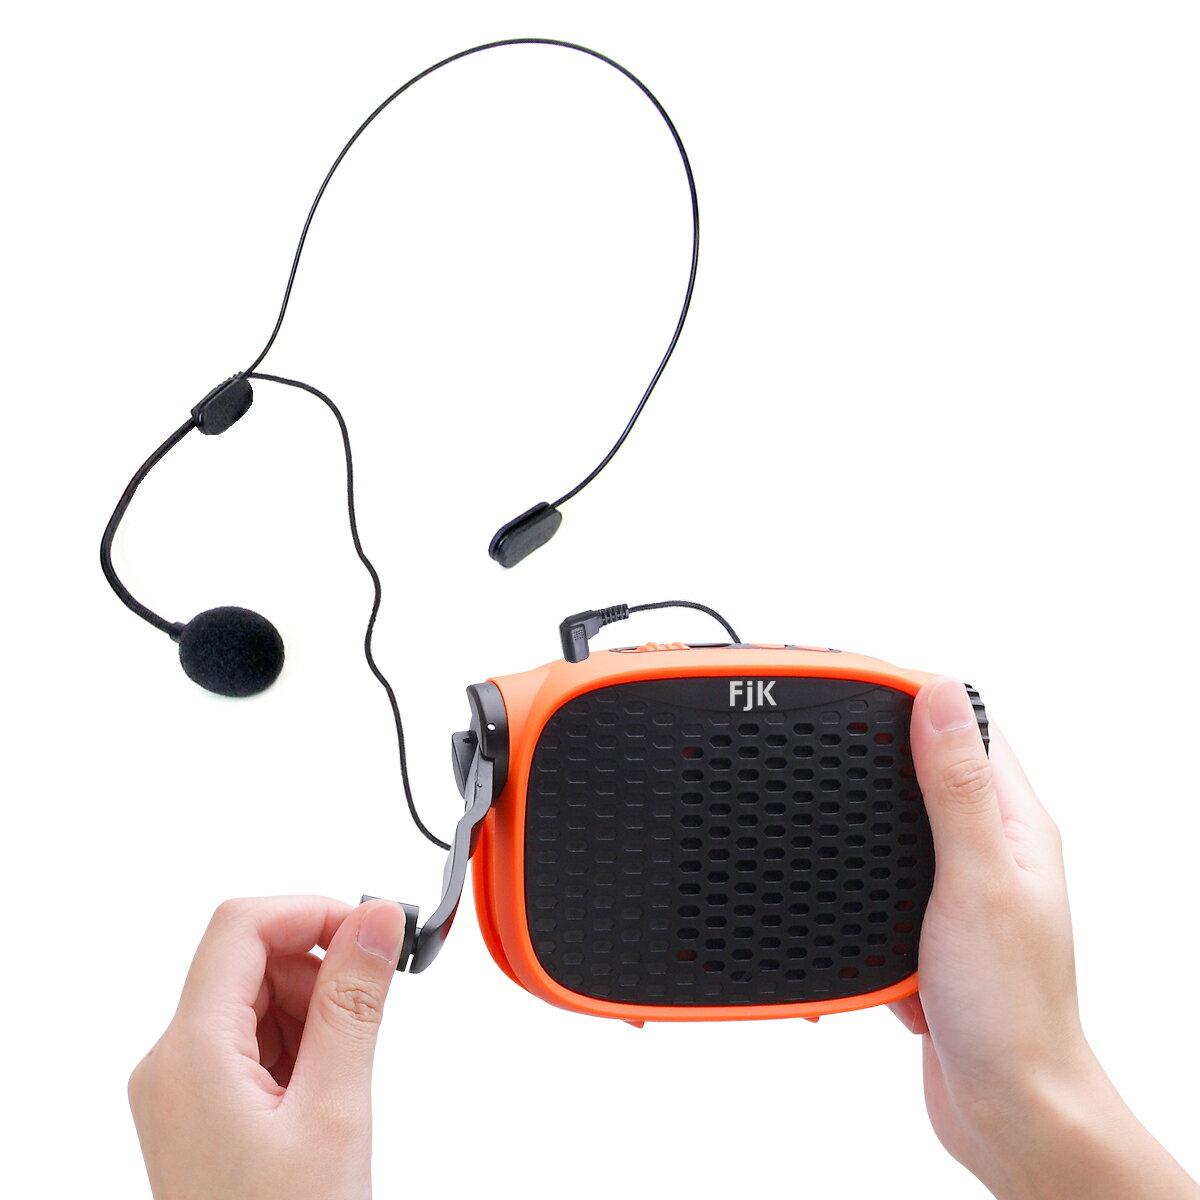 FJK 手回し充電式ハンズフリーメガホン(FMラジオ・録音機能付) FJK-D005 拡声器【あす楽対応】